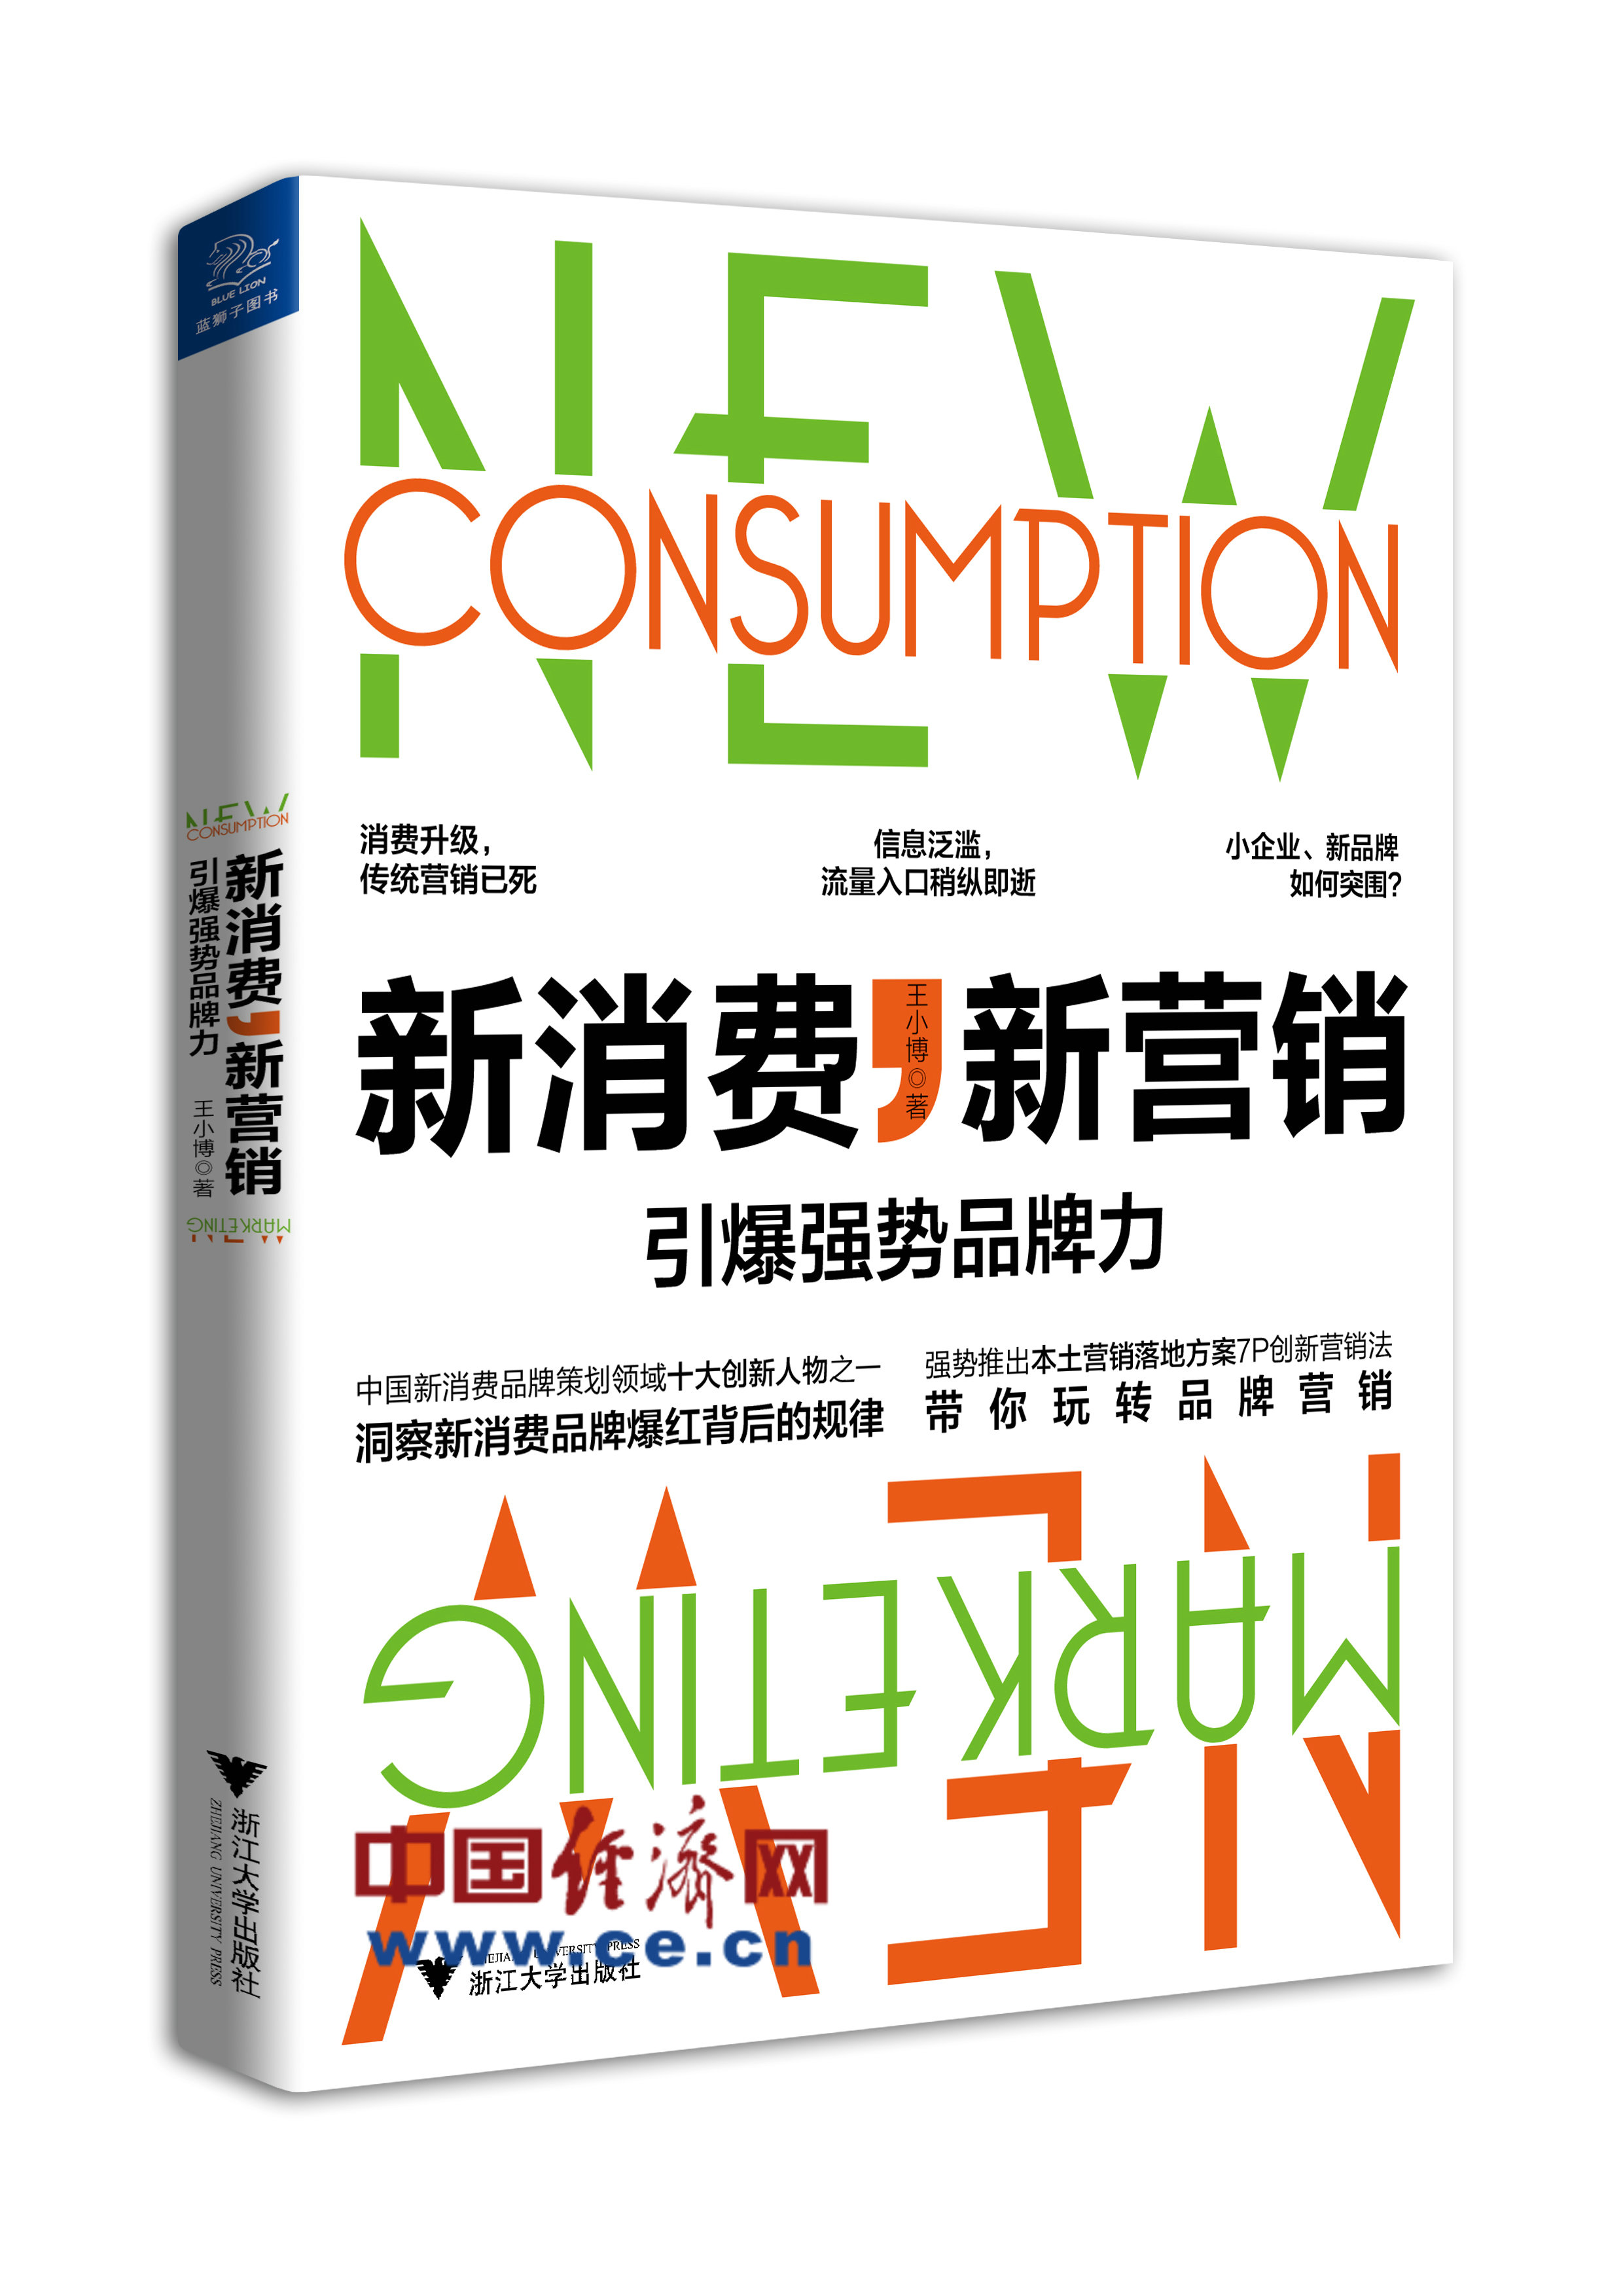 http://www.ybyzsbc.com/jiankang/1011367.html